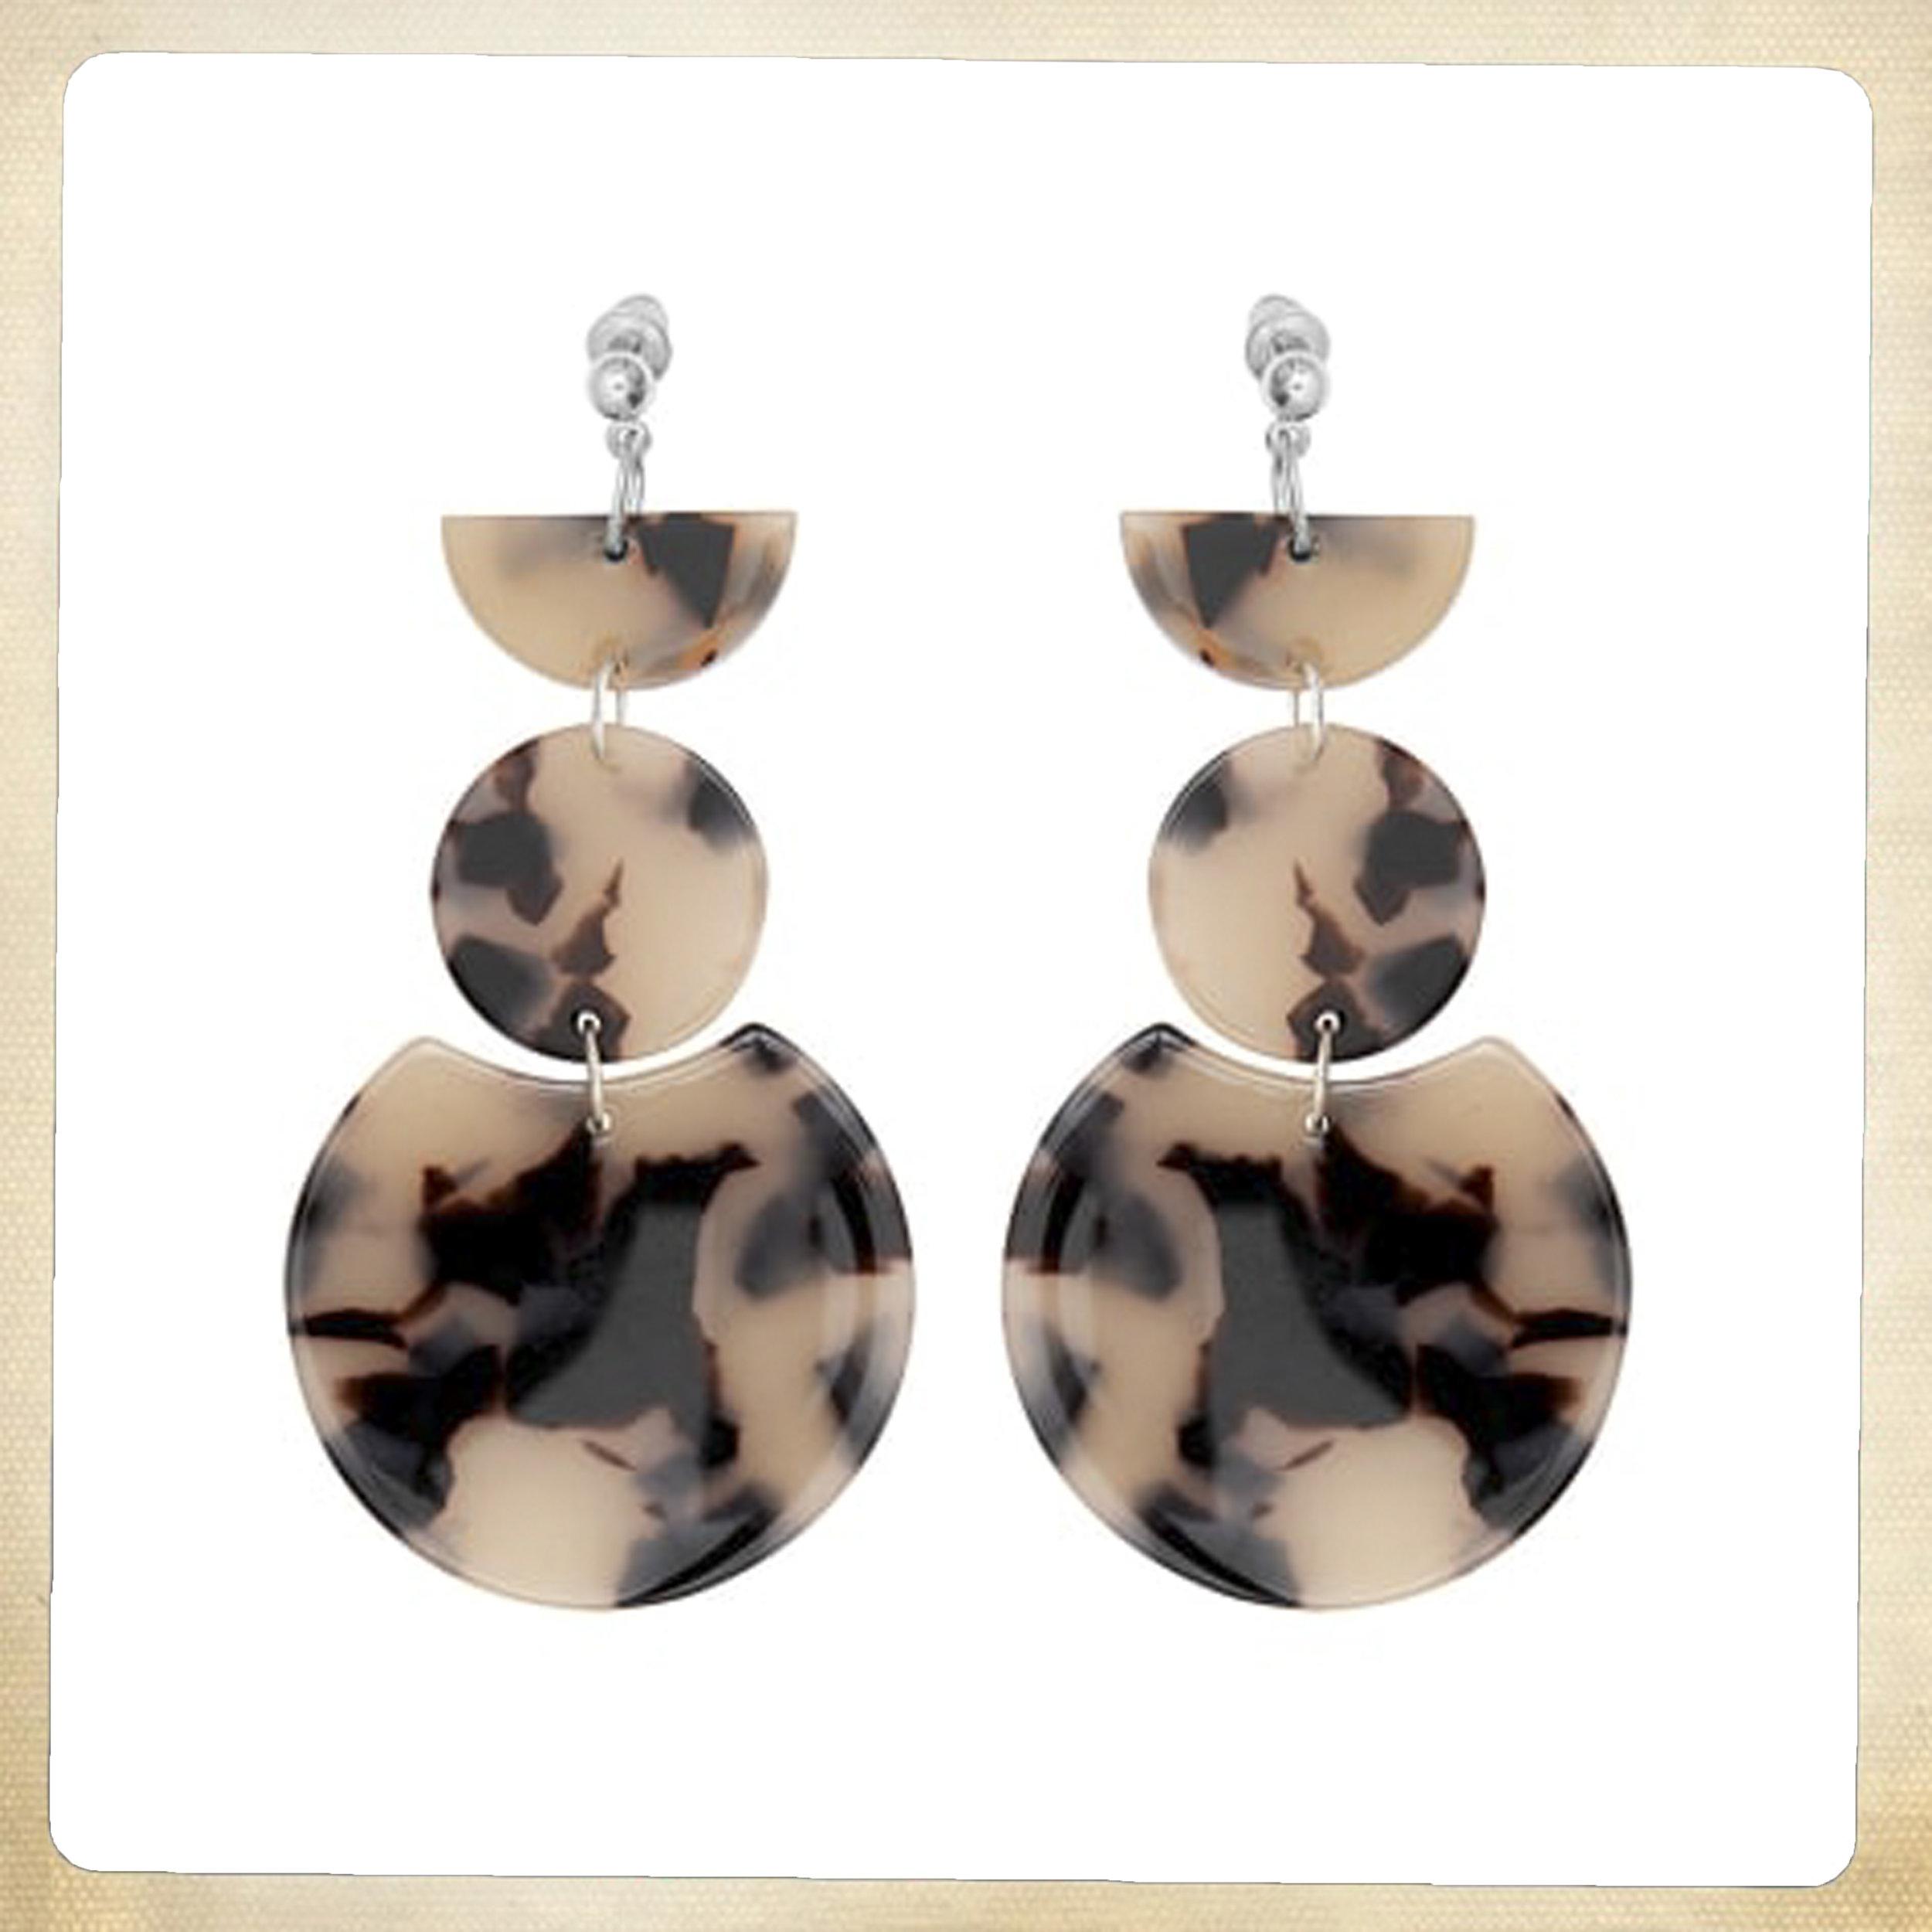 New earrings.jpg